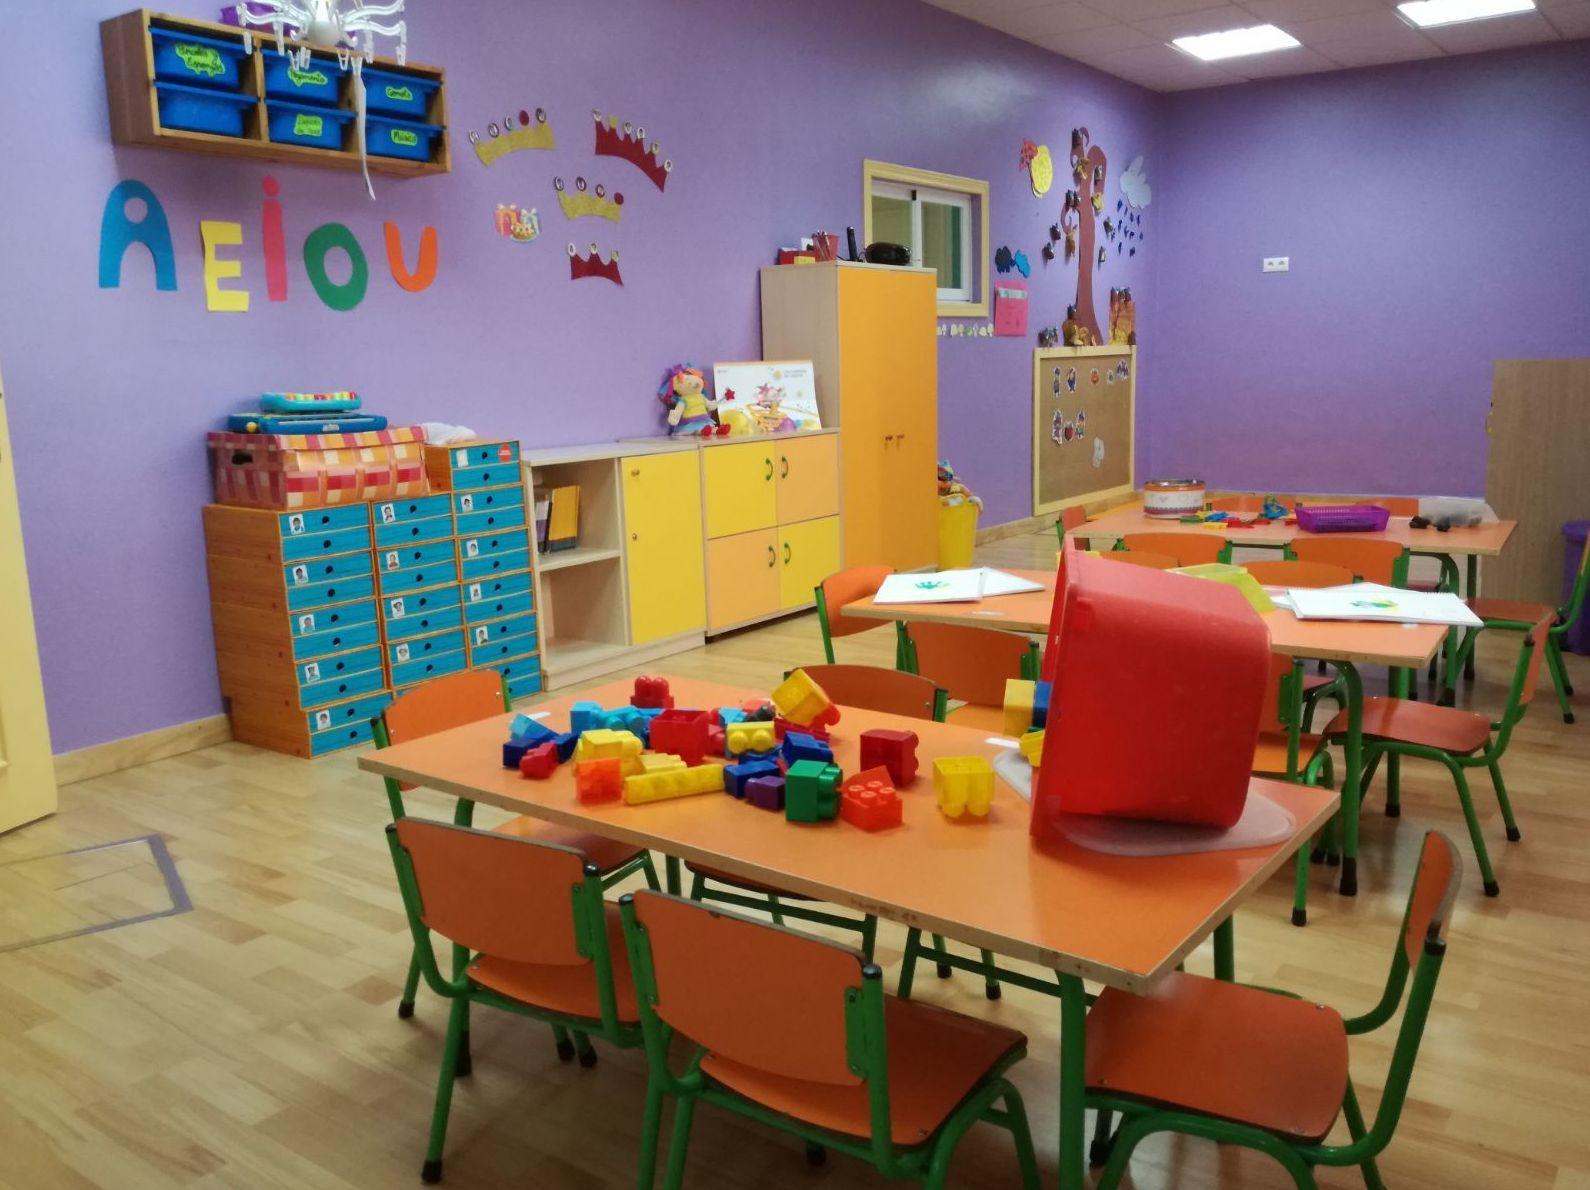 Foto 5 de Escuelas infantiles en Umbrete | Pipiolos Escuela Infantil